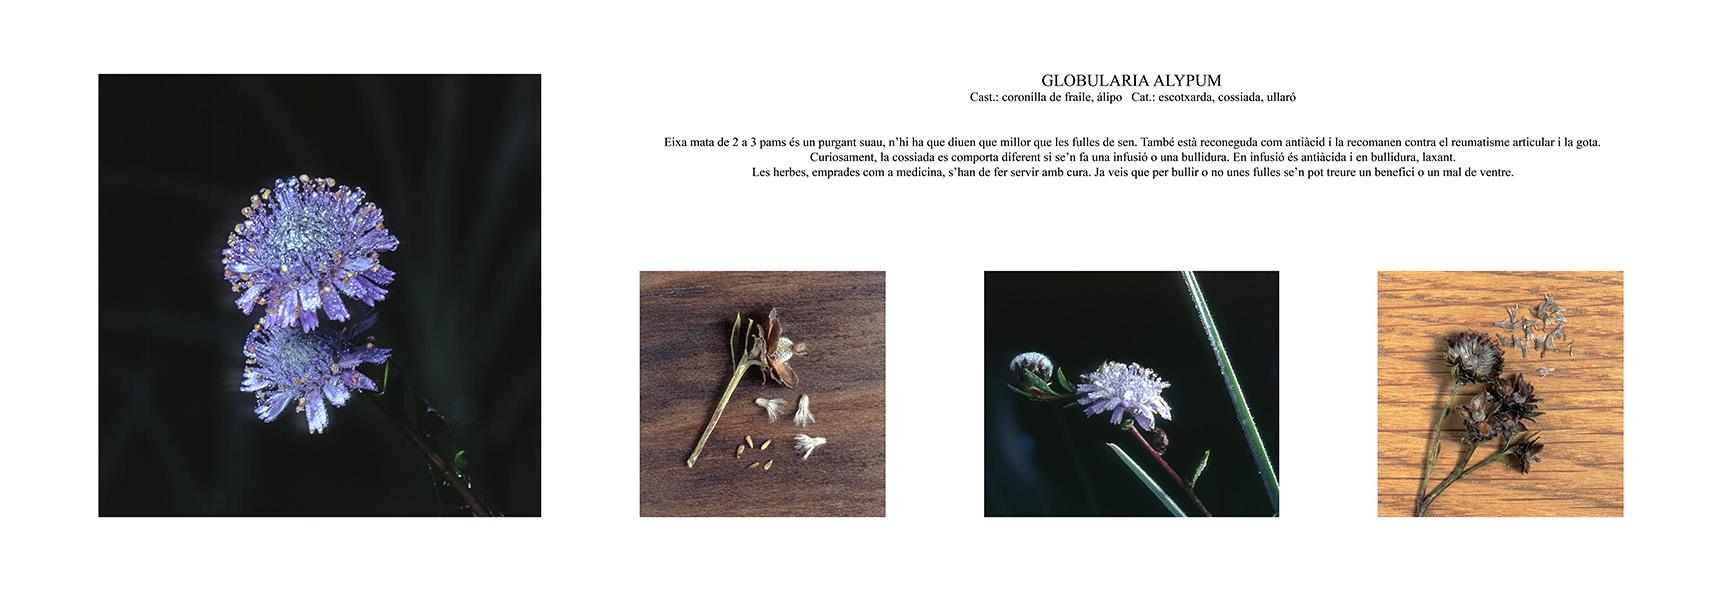 Pep Bonet Capellá-Botánica-Semillas-Macro fotografía (6)